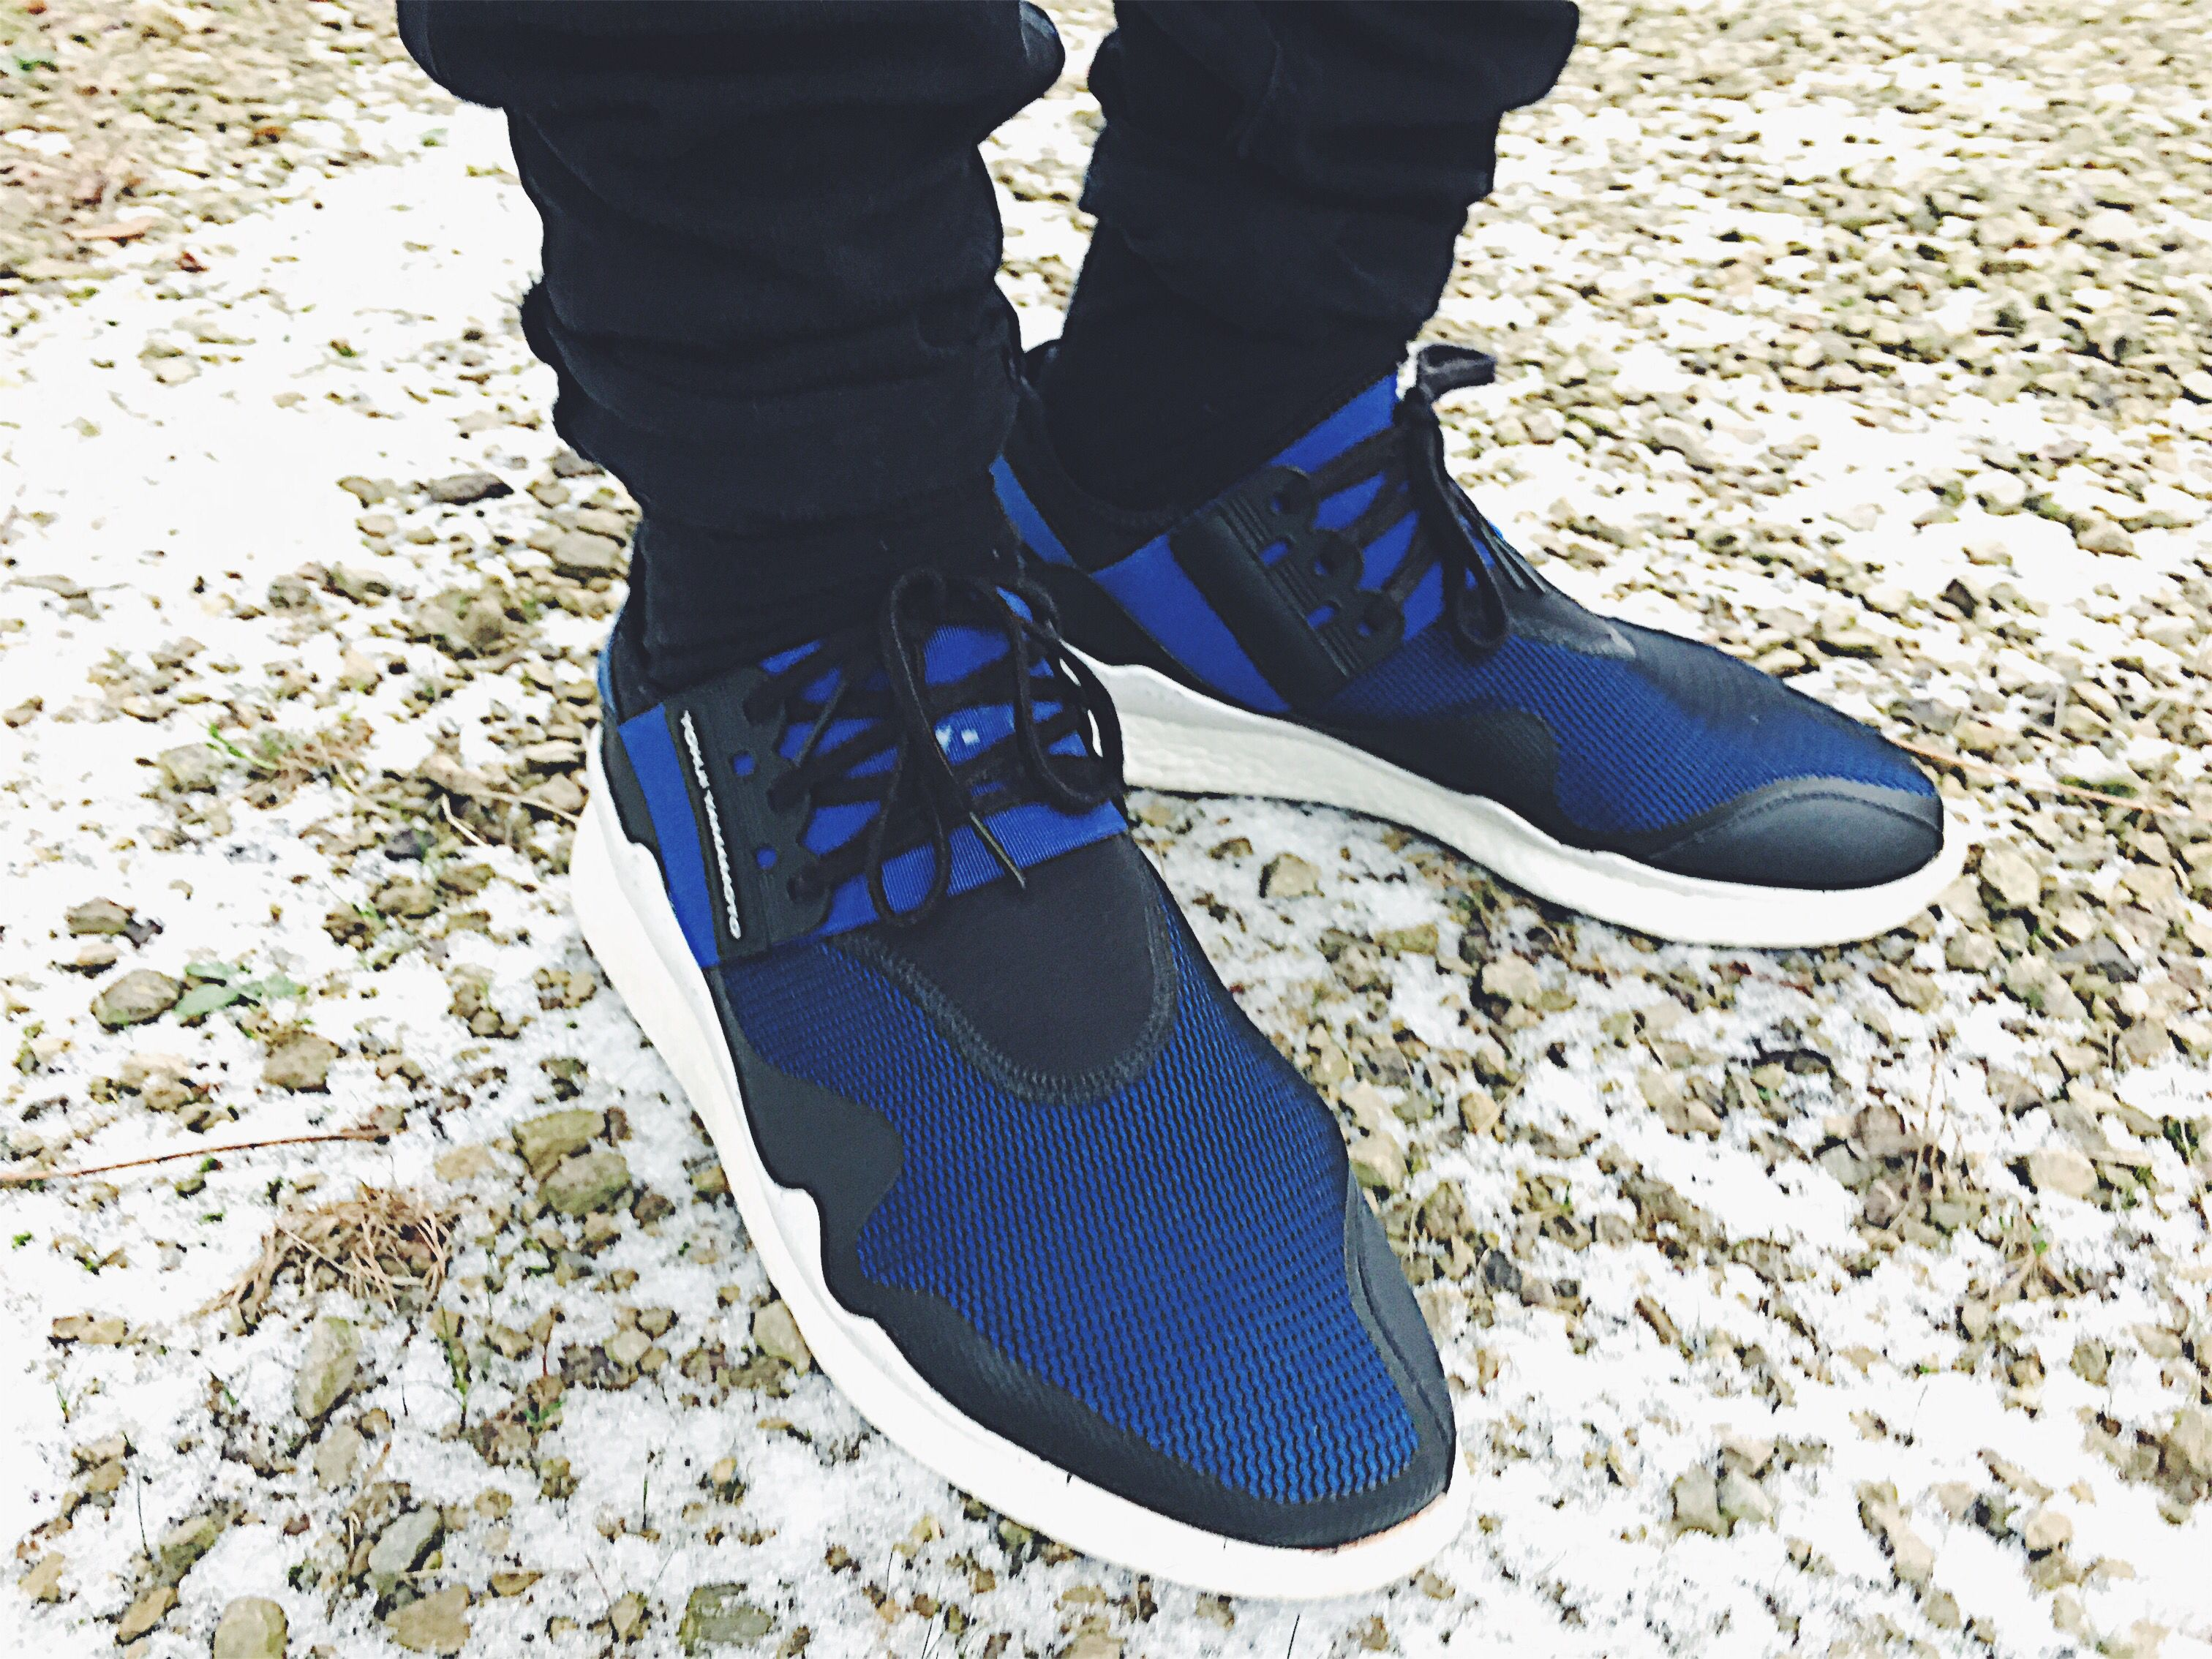 Y 3 Retro Boost Black Electric Blue